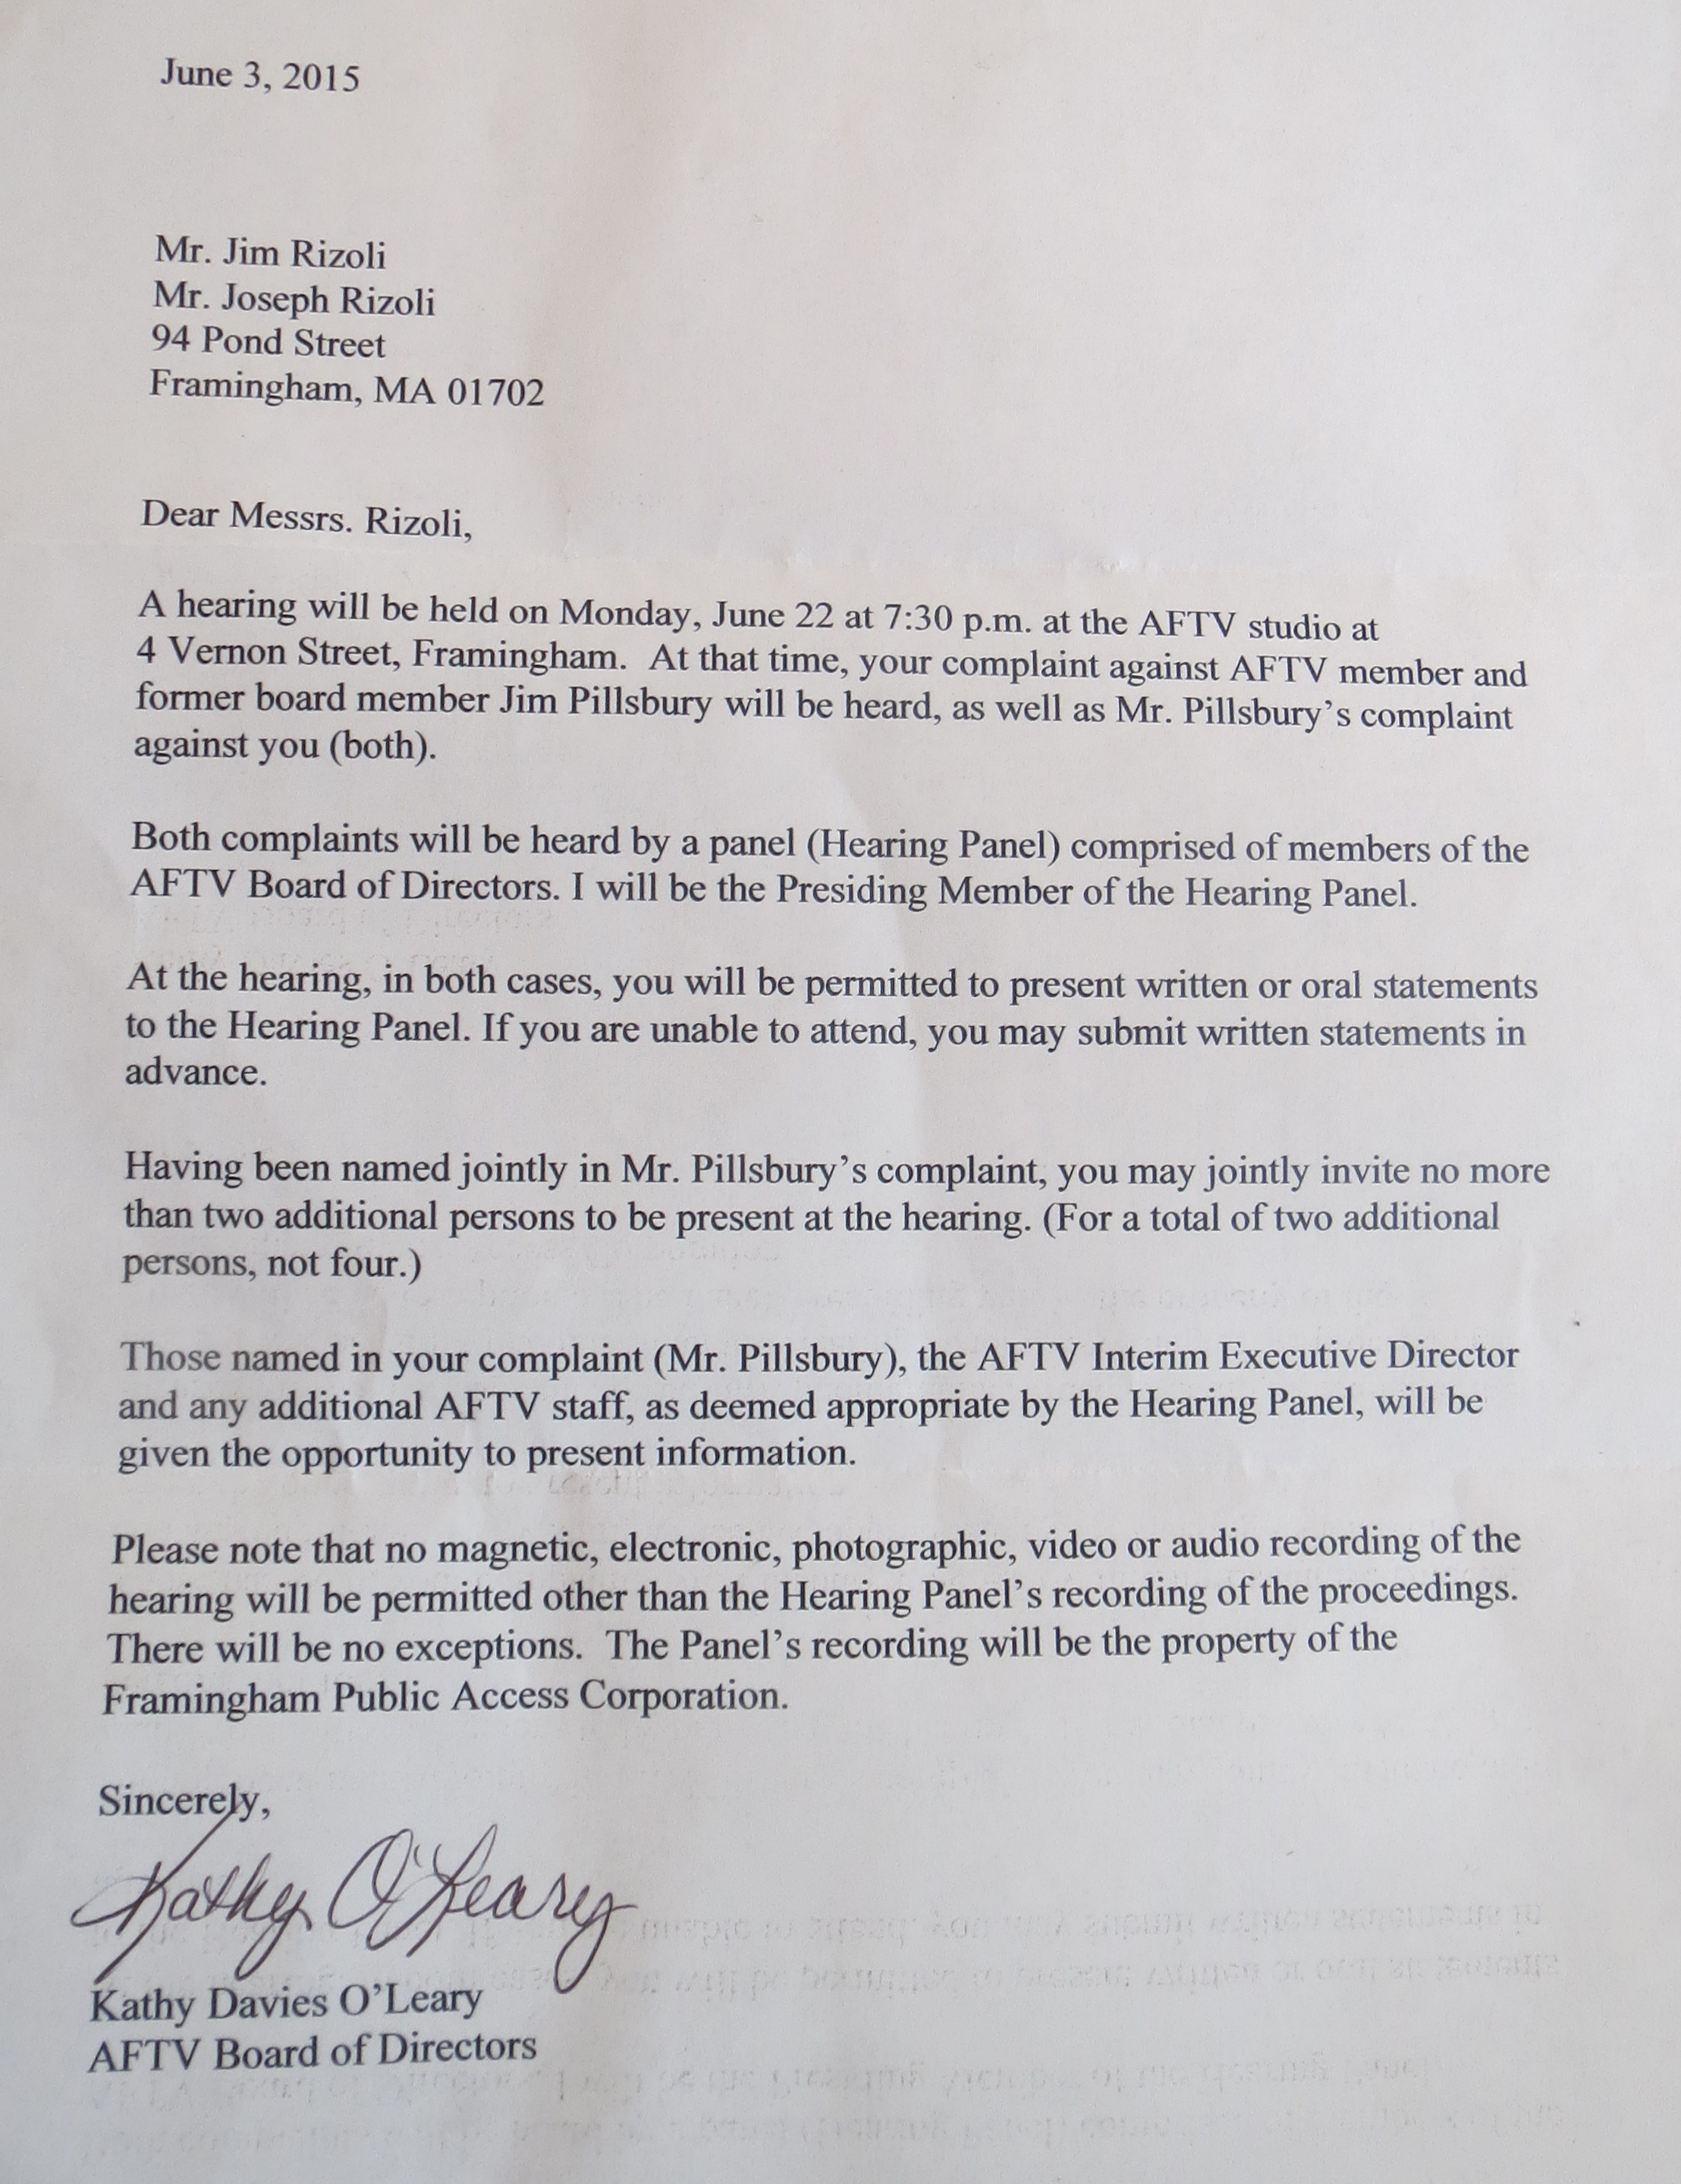 More bully tactics from af tv httpabetterframingham images aftv rizoli letter 20150603 g spiritdancerdesigns Gallery